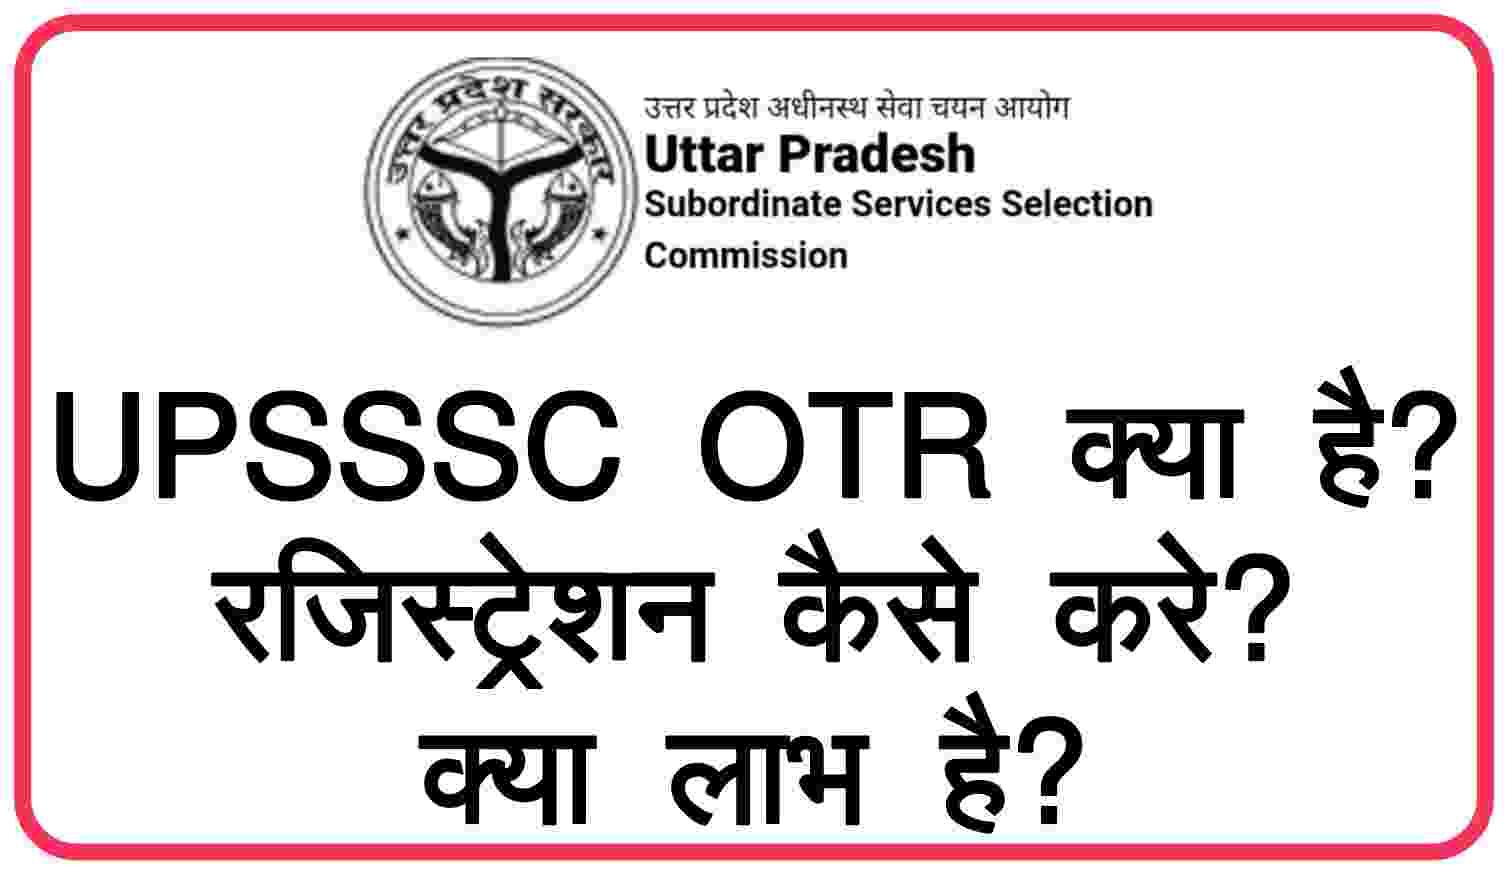 UPSSSC OTR Kya Hai In Hindi